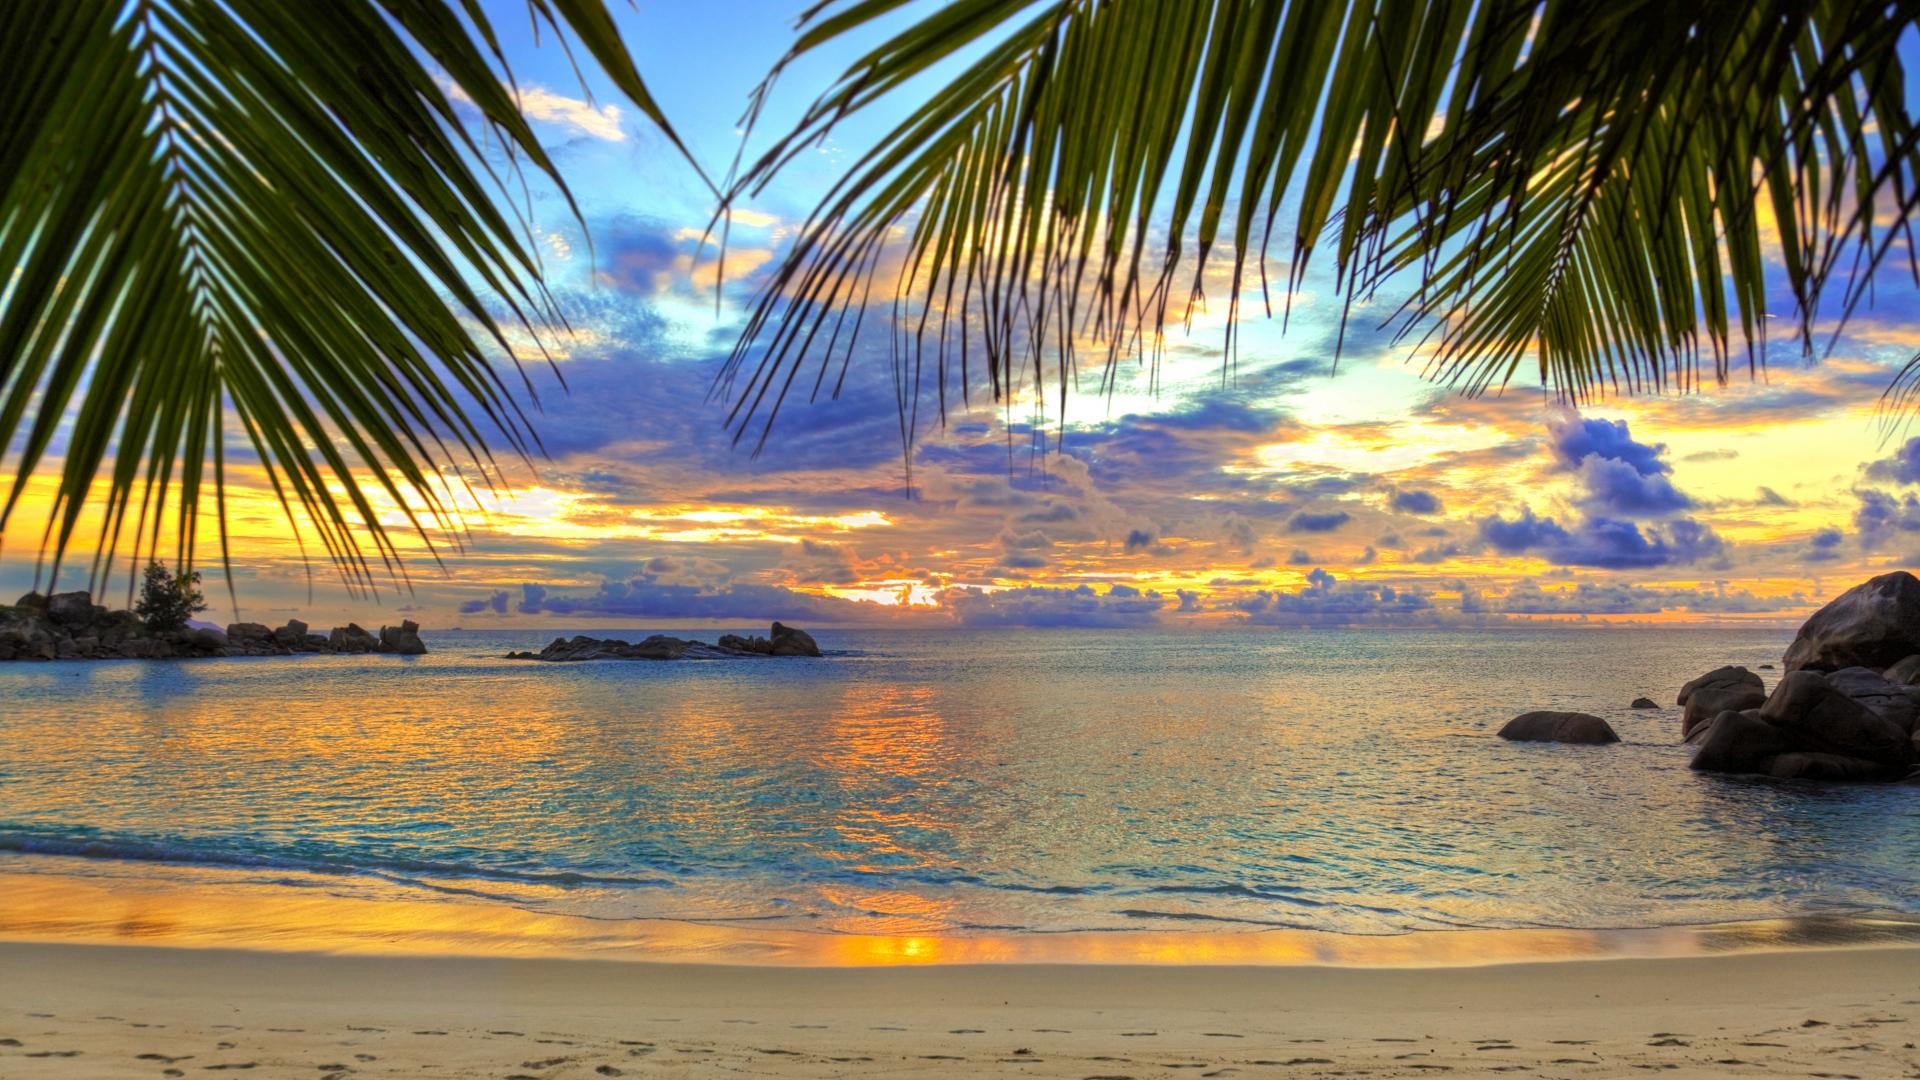 beach-tropics-sea-sand-palm-trees-1920x1080-1920×1080-wallpaper-wpc5802602